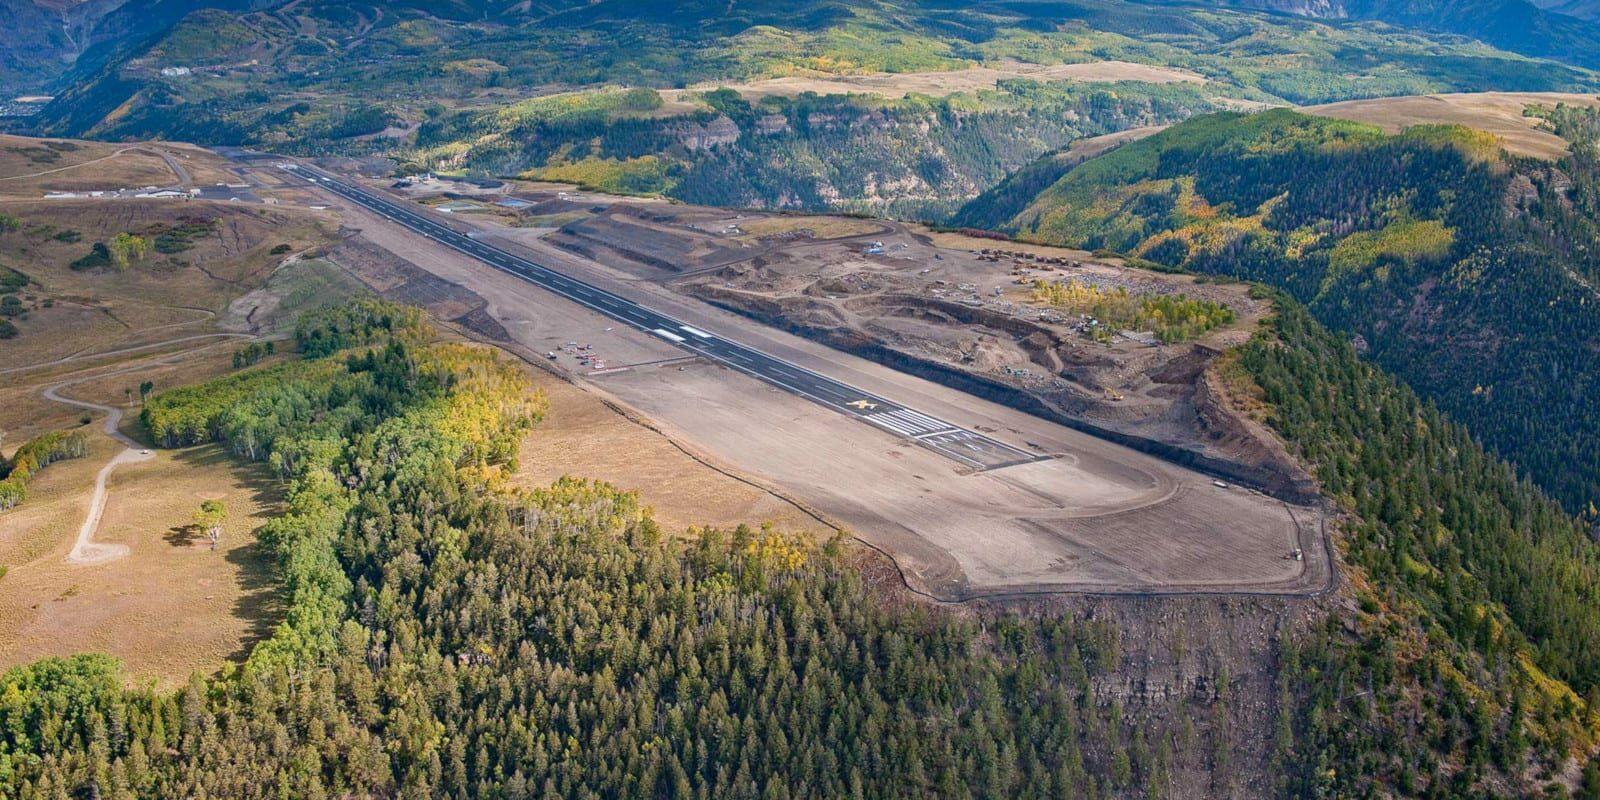 Colorado Commercial Airports Telluride Regional Airport Runway